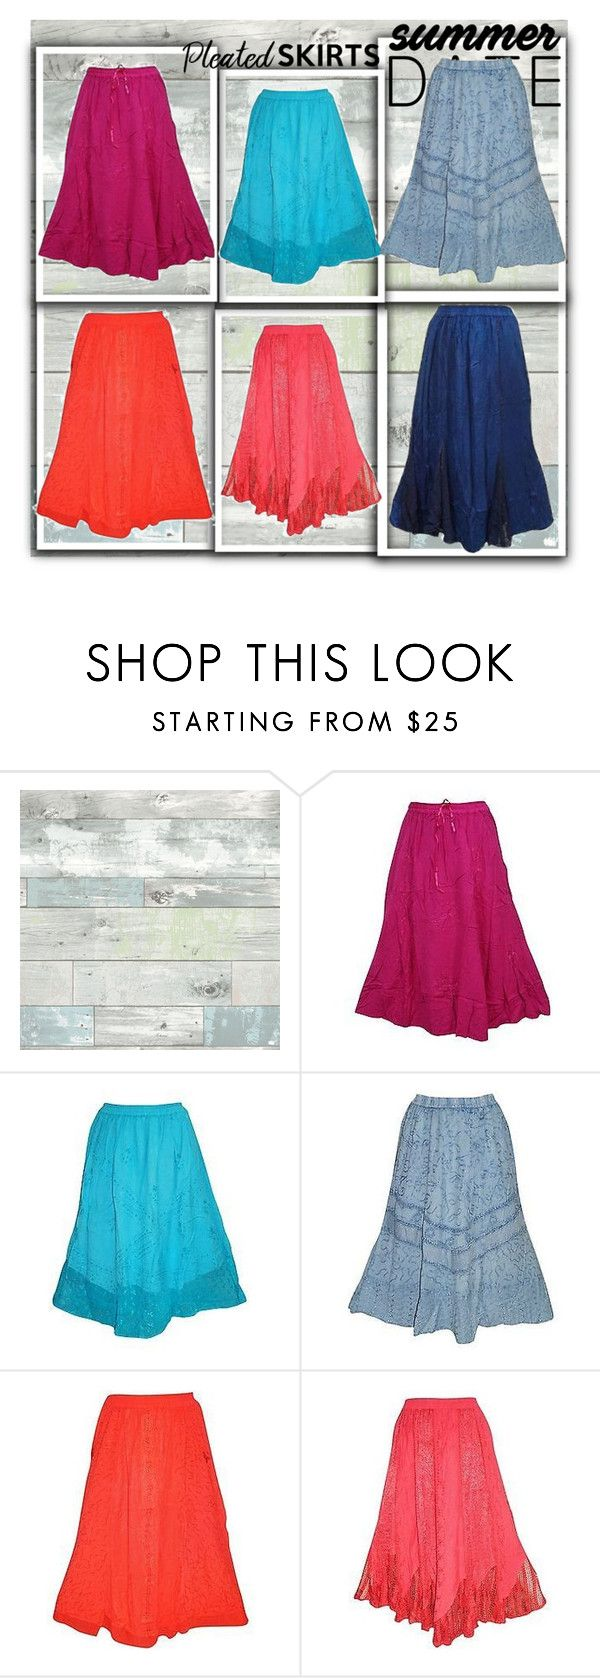 Bohemian Gypsy Long Skirts by baydeals on Polyvore featuring Wall Pops!  http://stores.ebay.com/mogulgallery/WOMENS-SKIRTS-/_i.html?_fsub=678282219&_sid=3781319&_trksid=p4634.c0.m322